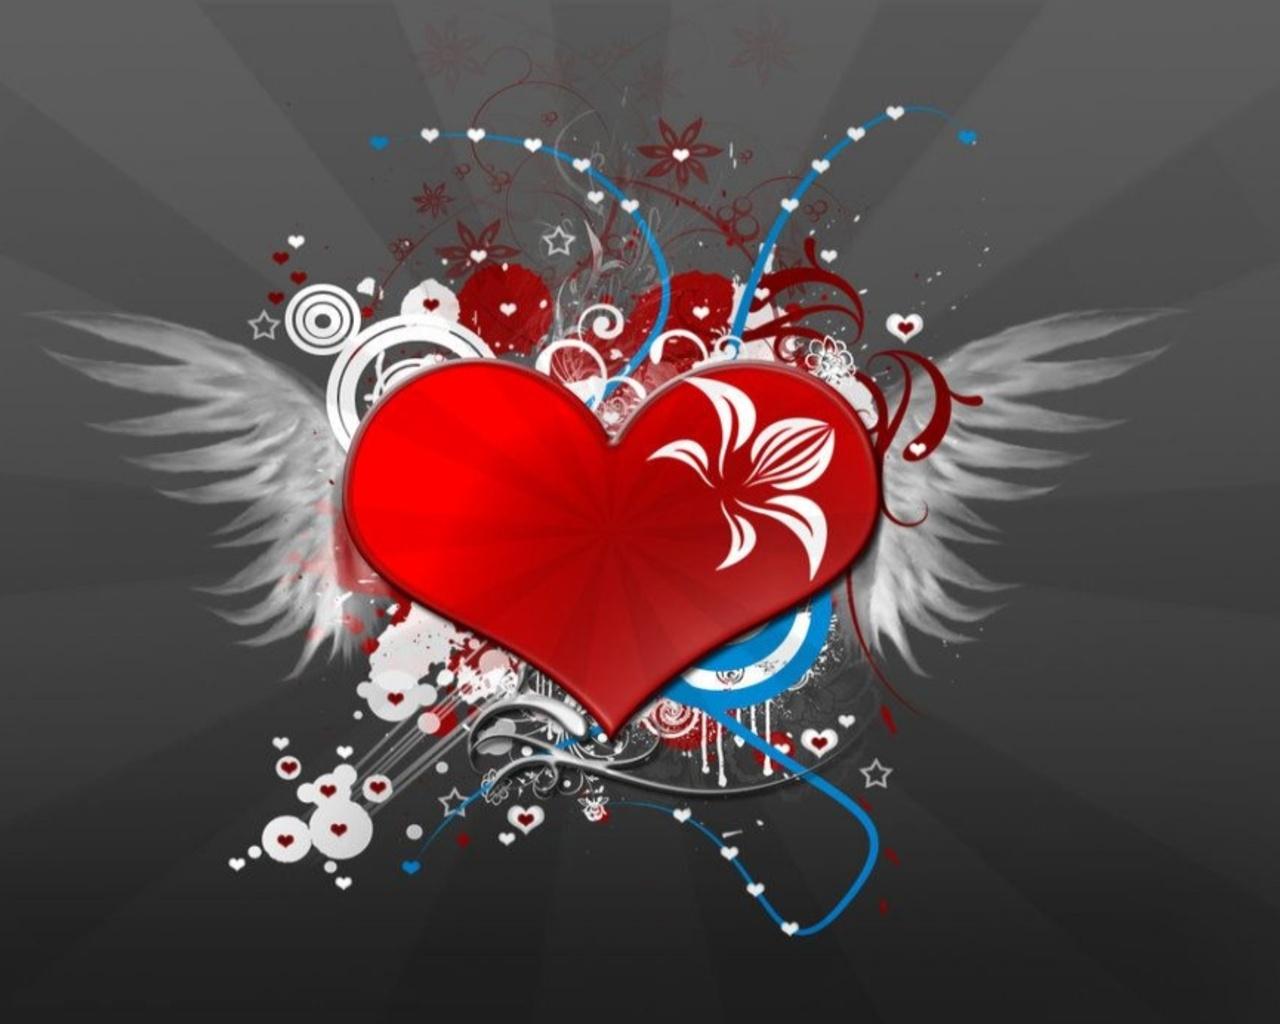 http://1.bp.blogspot.com/-6uwHhofbJSw/T0eCnq2ORoI/AAAAAAAAAzw/Rsk4Wc0nNEw/s1600/Valentines+Day+Wallpaper7.jpg